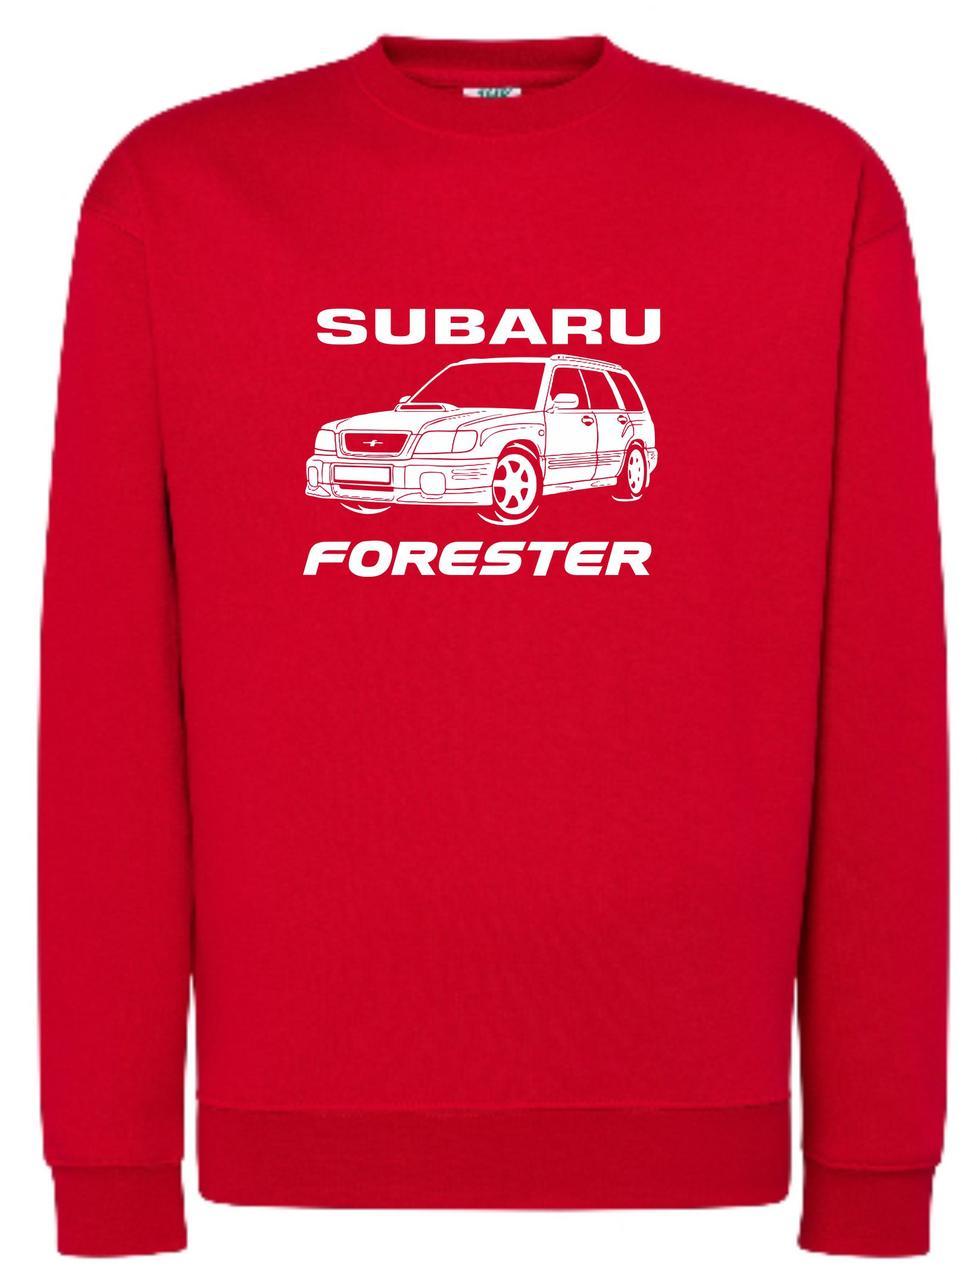 Реглан унісекс Subaru forester red